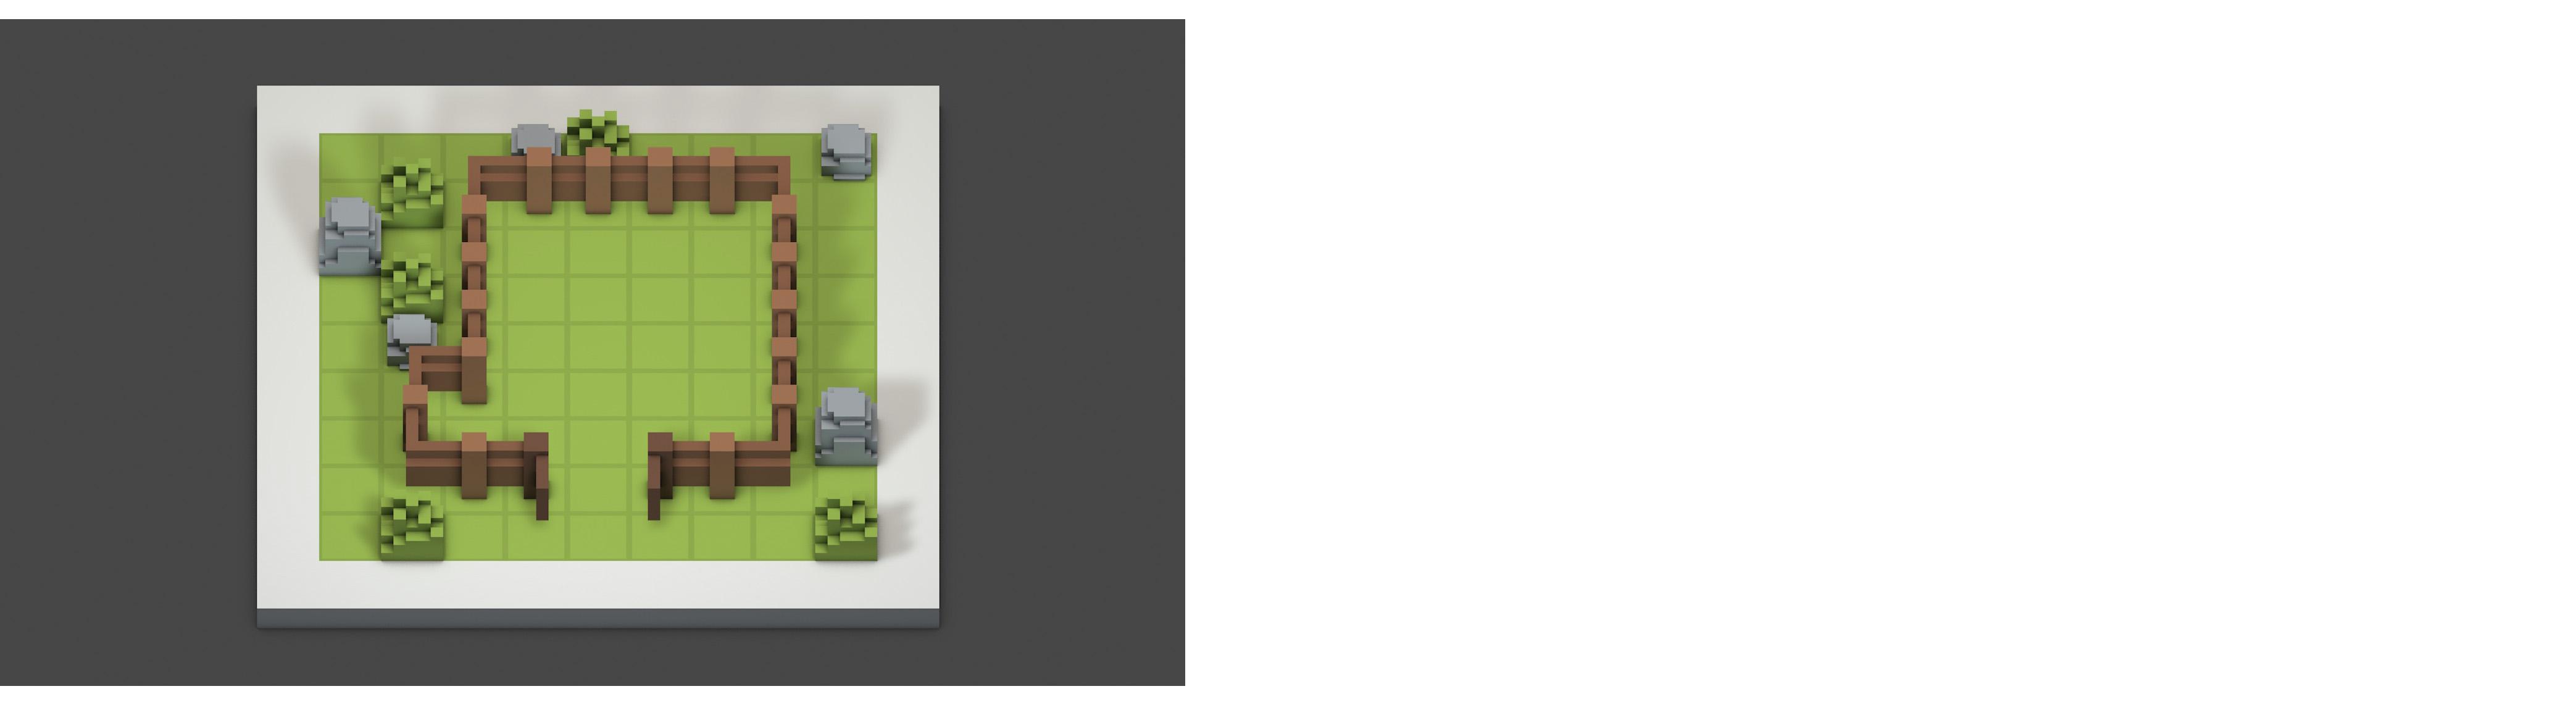 SheepPenPlane | Ищу программиста. Мобильная разрабокта казуалок.